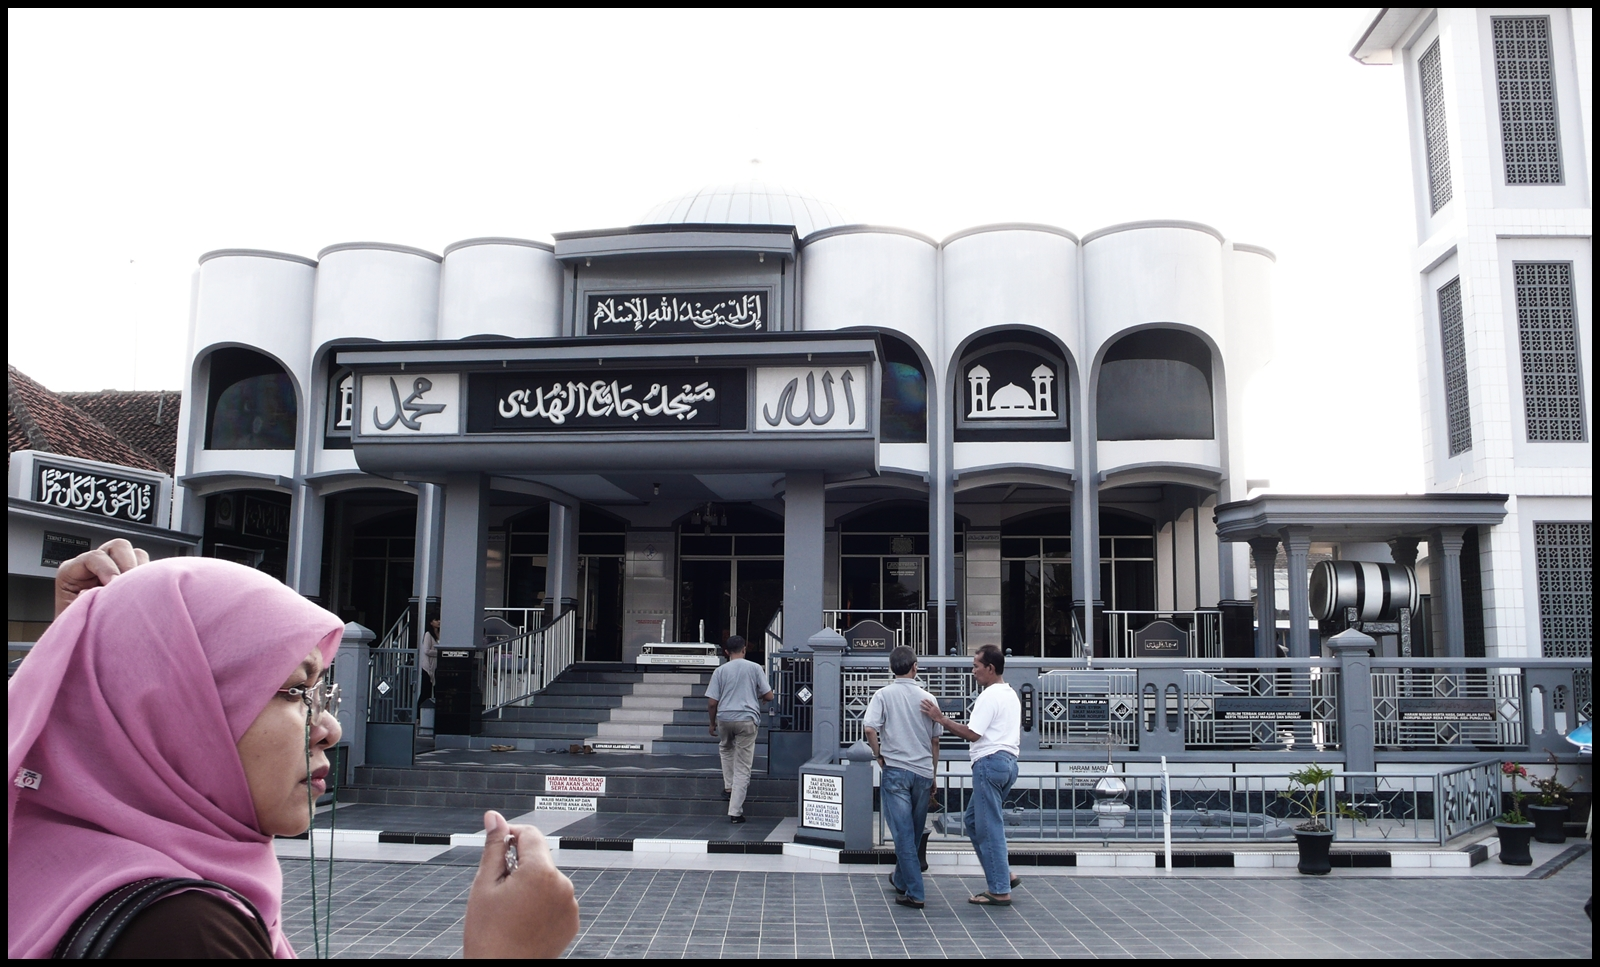 The Hartanto s Family Welcome To Masjid Al Huda Desa Manislor